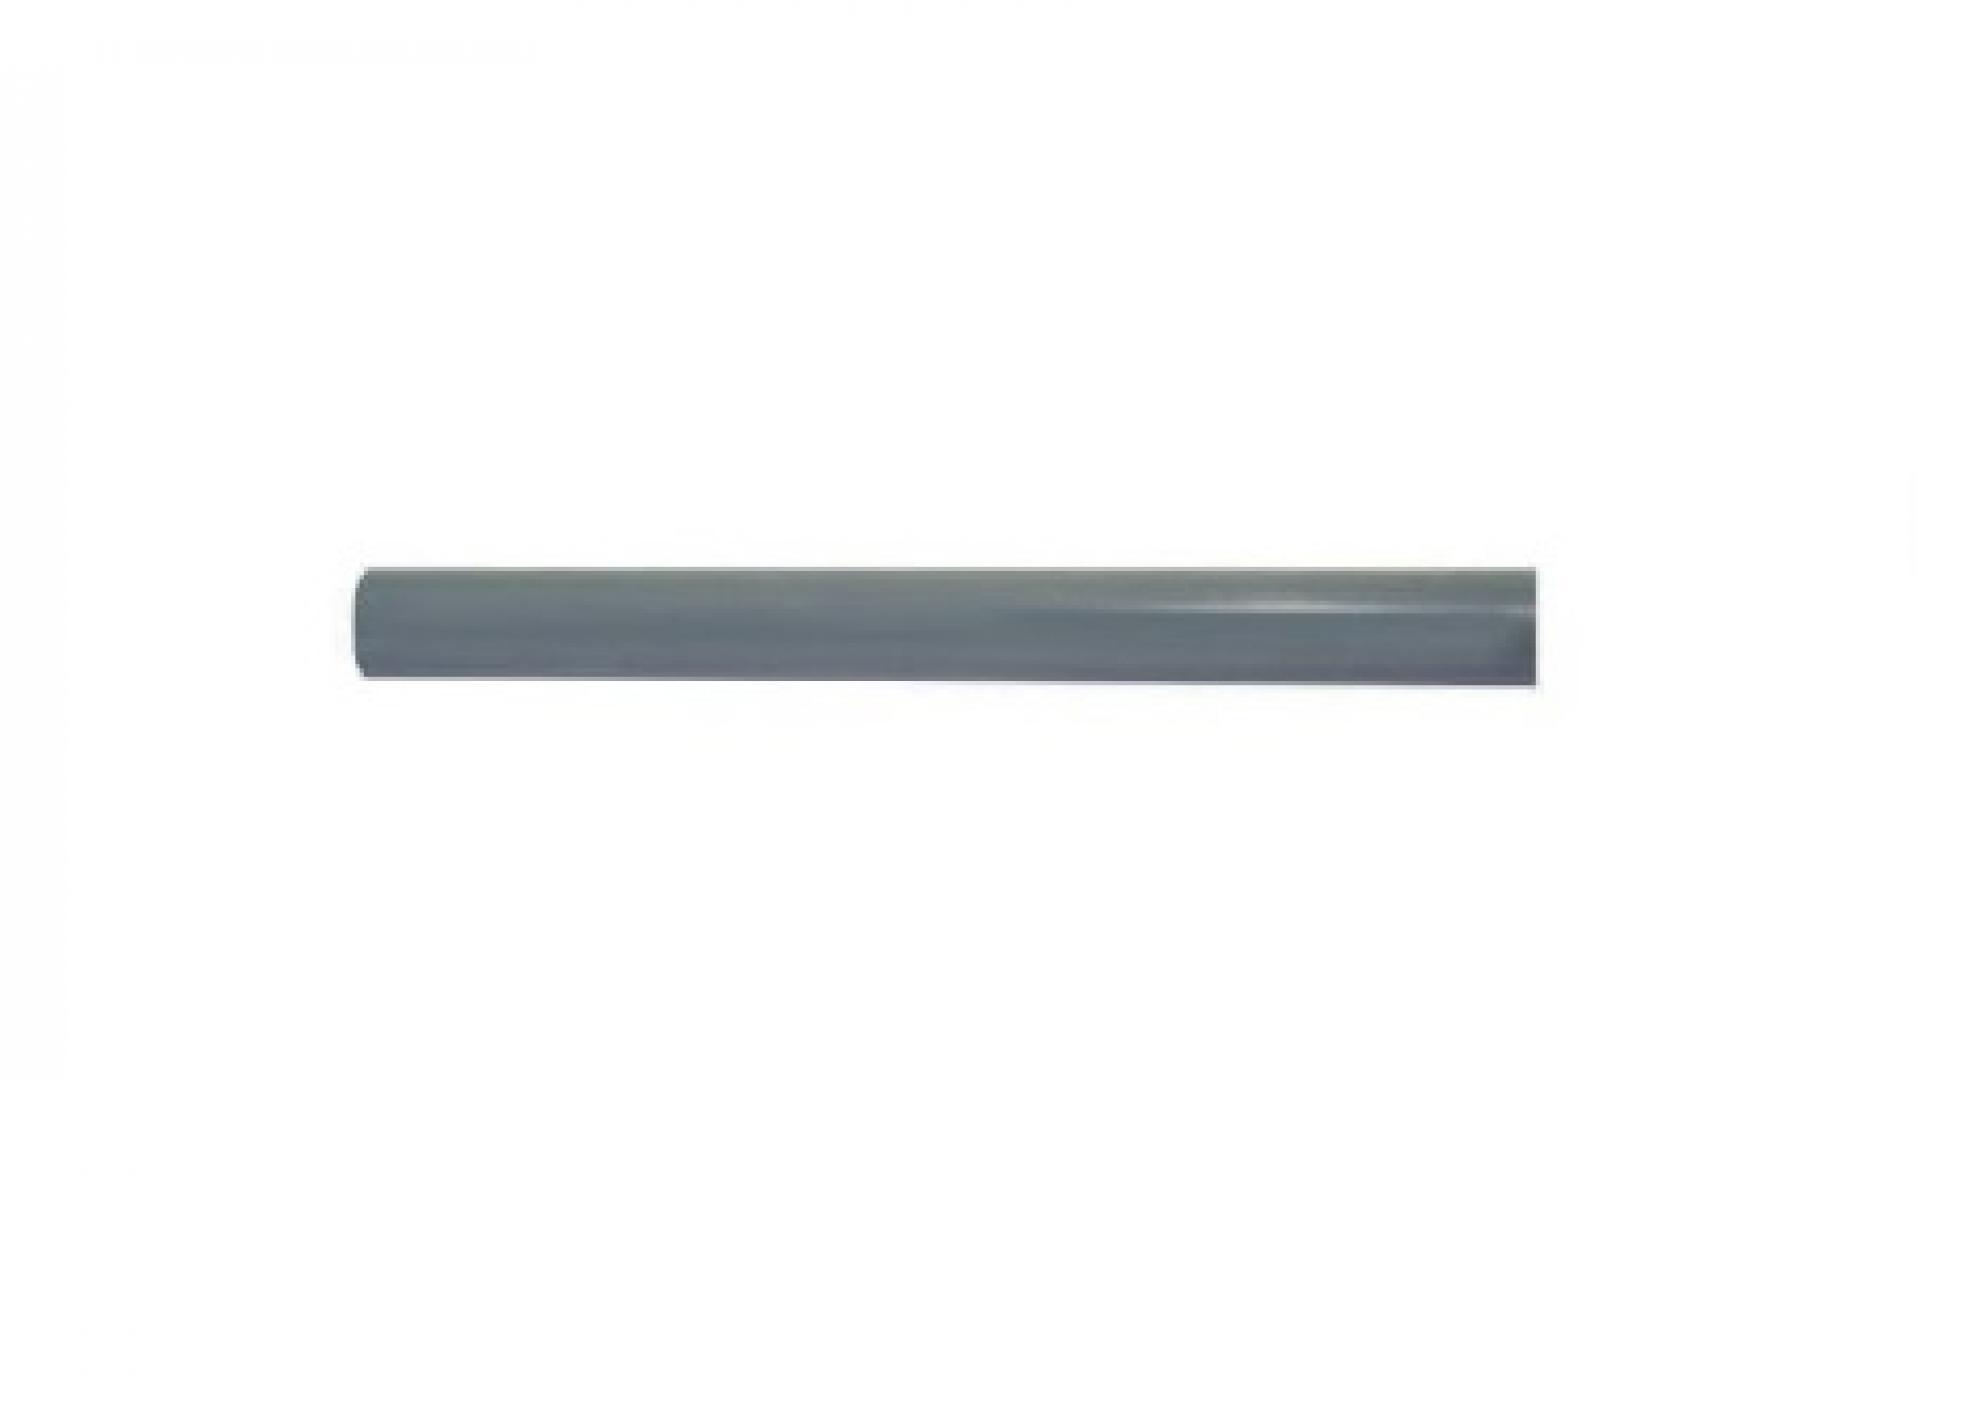 "Eletroduto PVC 1/2"" polegadas - Cinza"